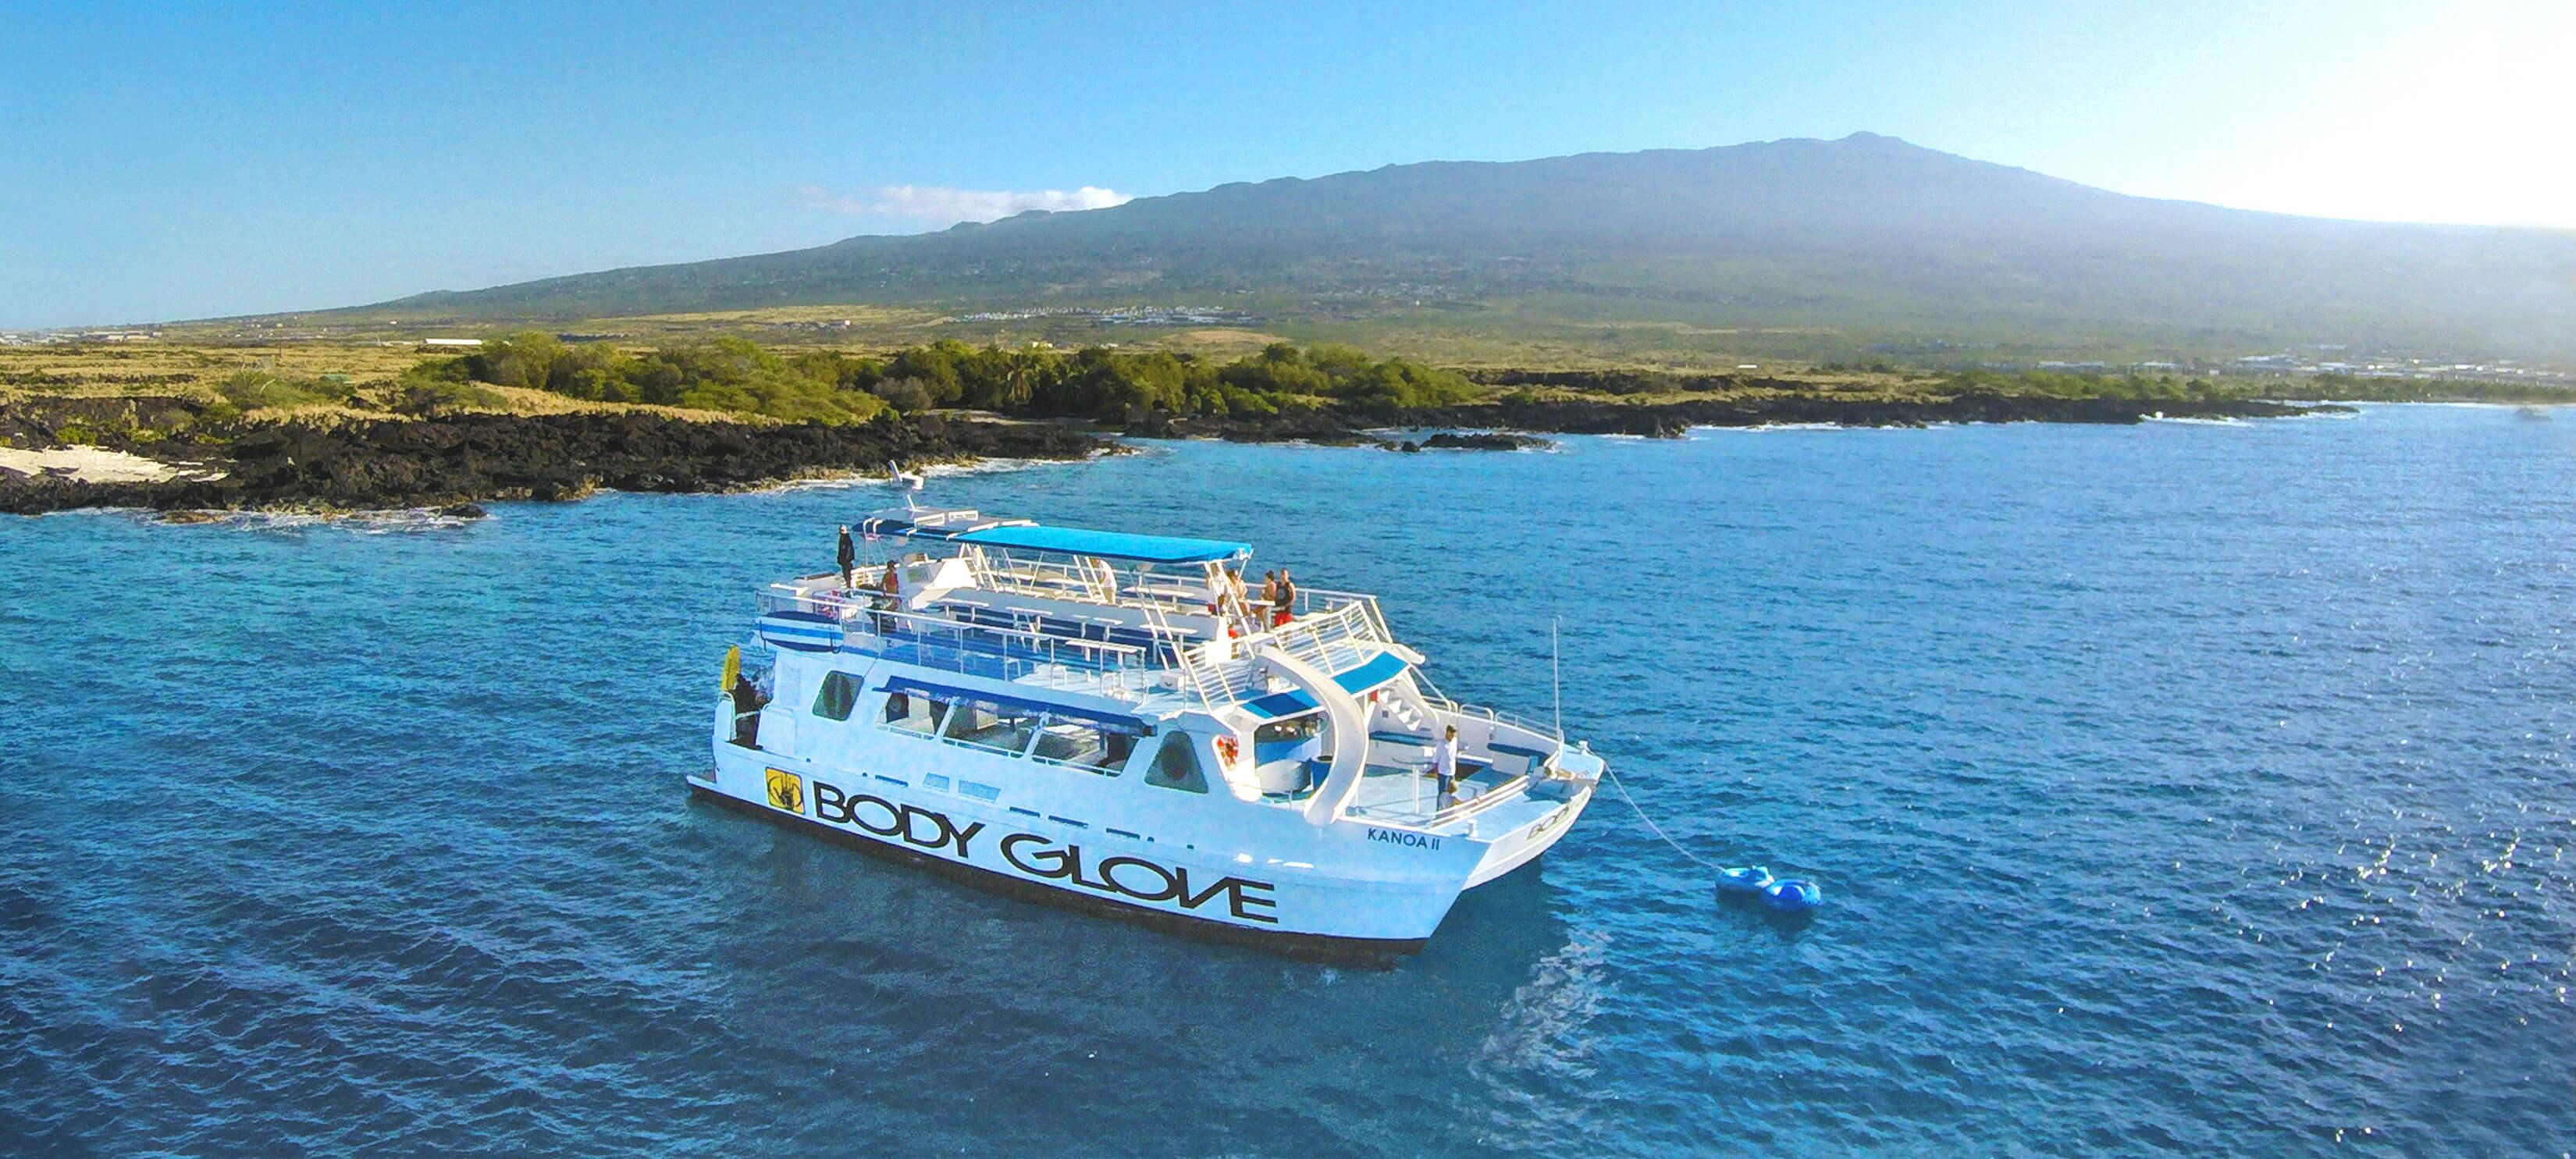 Body Glove Hawaii » Kona Whale Watching, Dinner Cruises, Snorkeling ...